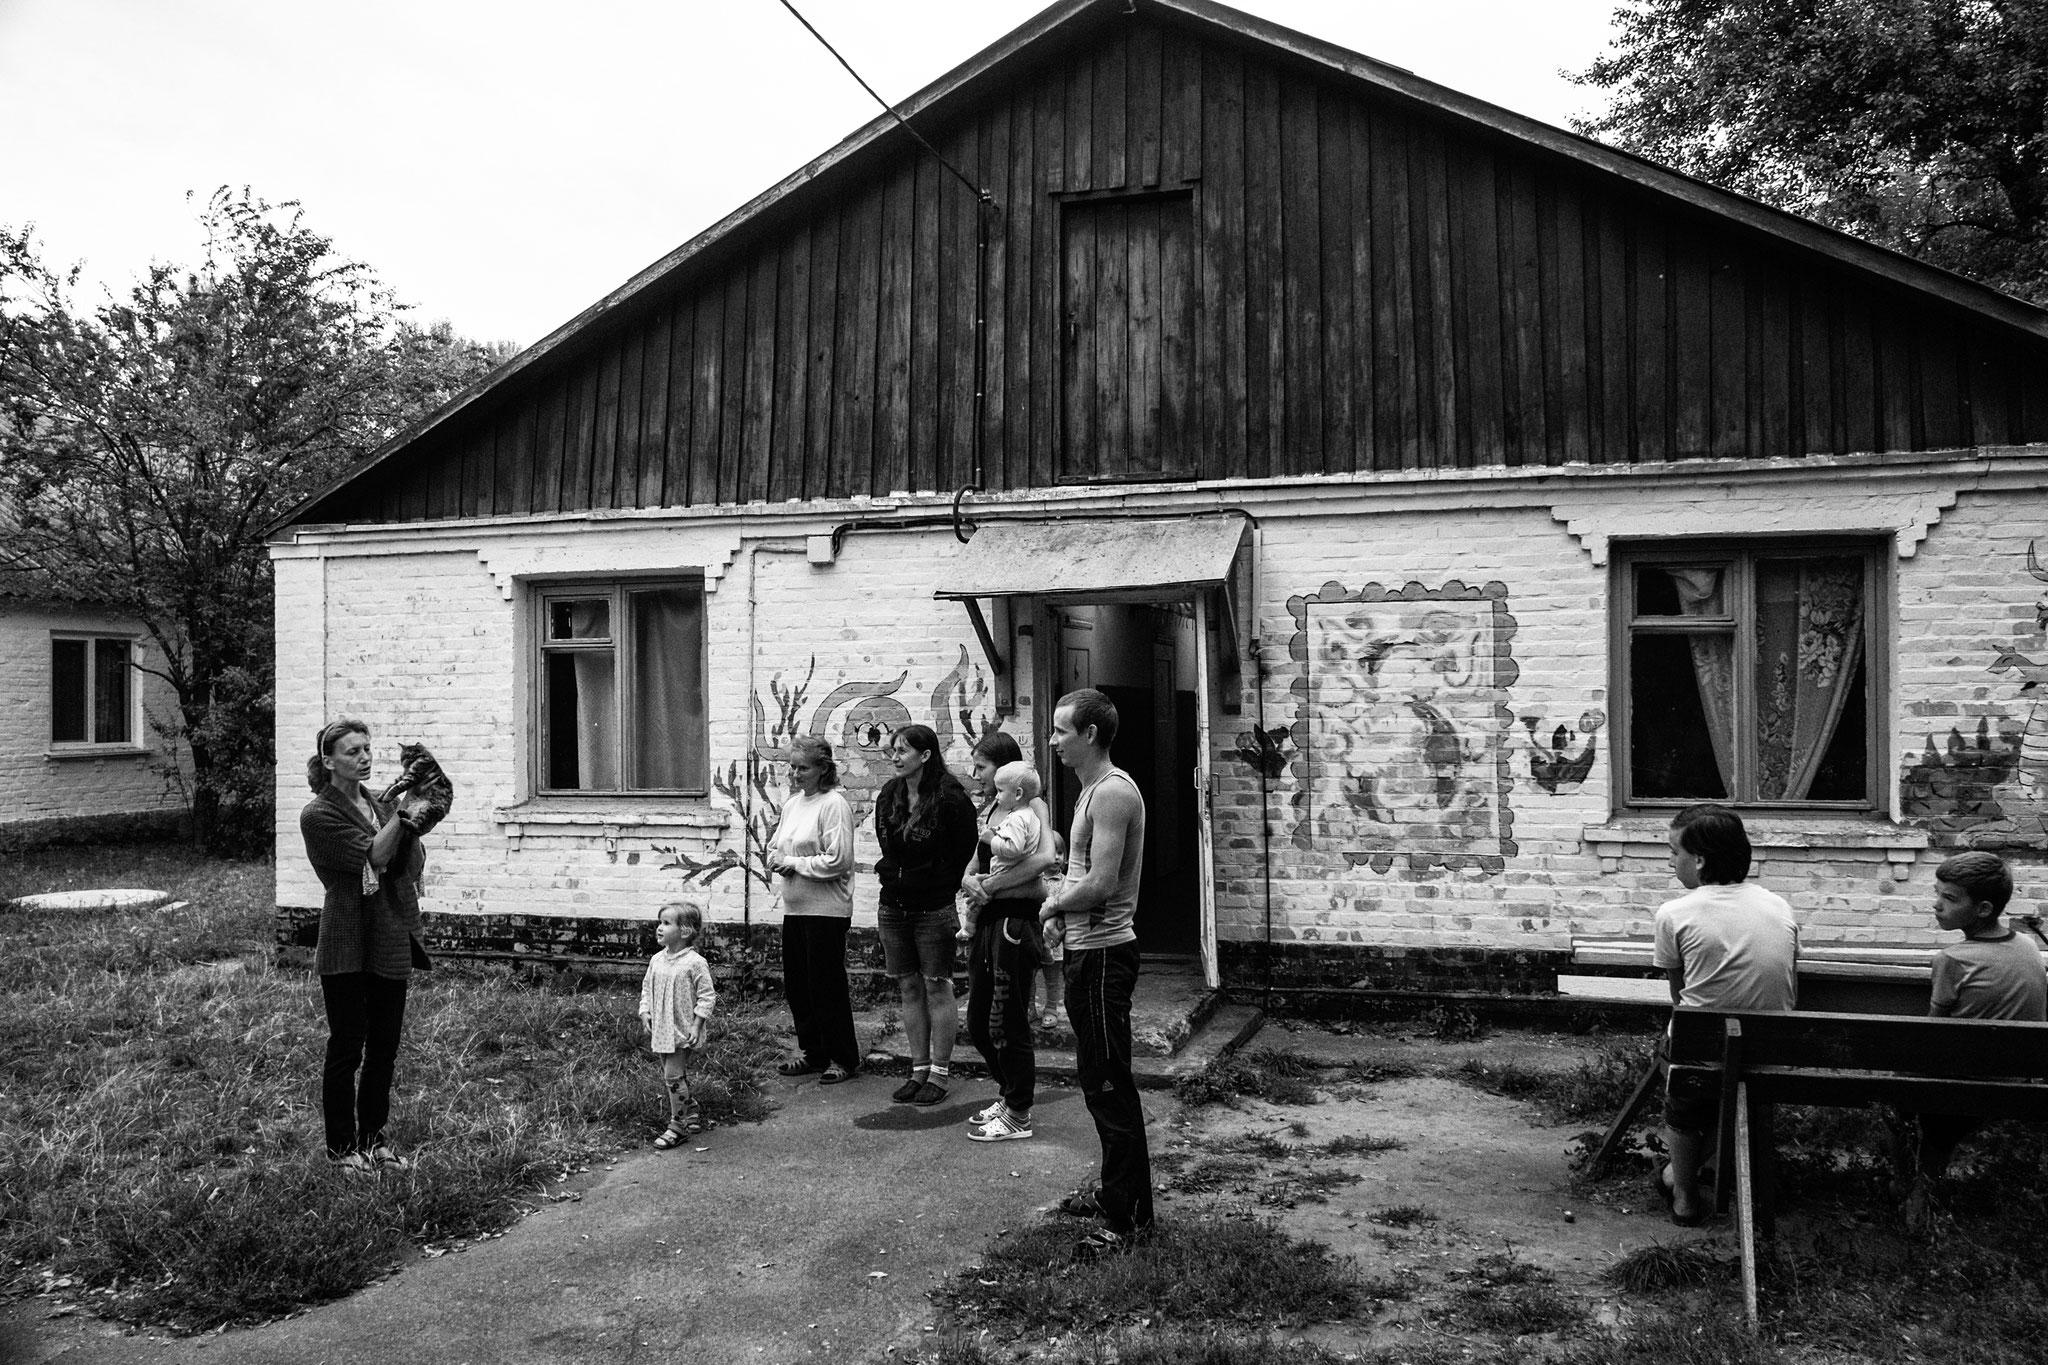 IDP Camp, former youth camp, near Vinitza, 2016